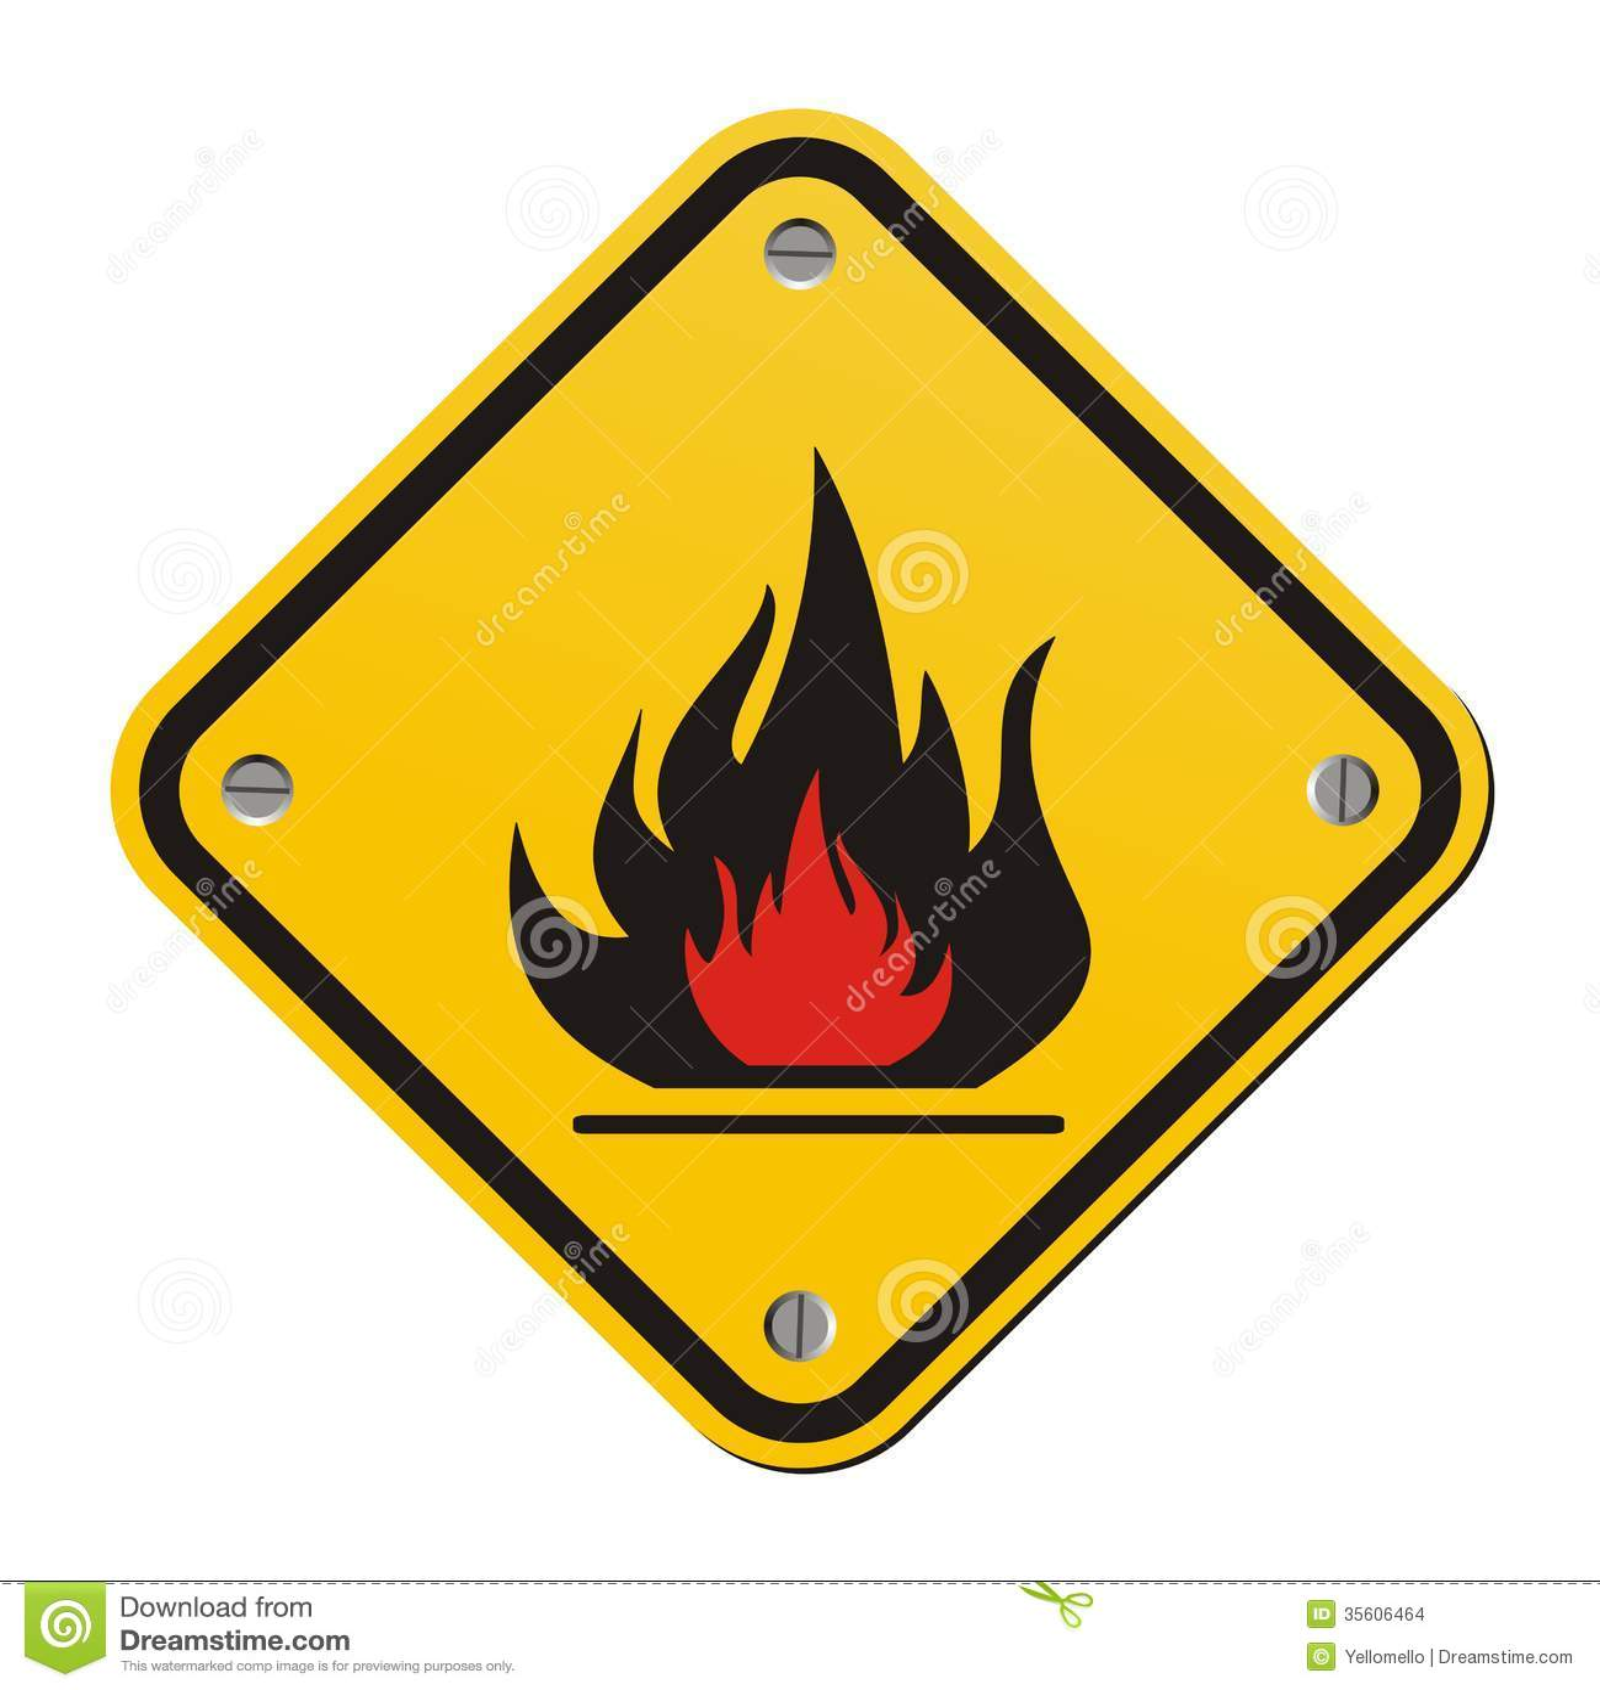 Flammable warning sign stock illustration illustration of flame flammable warning sign buycottarizona